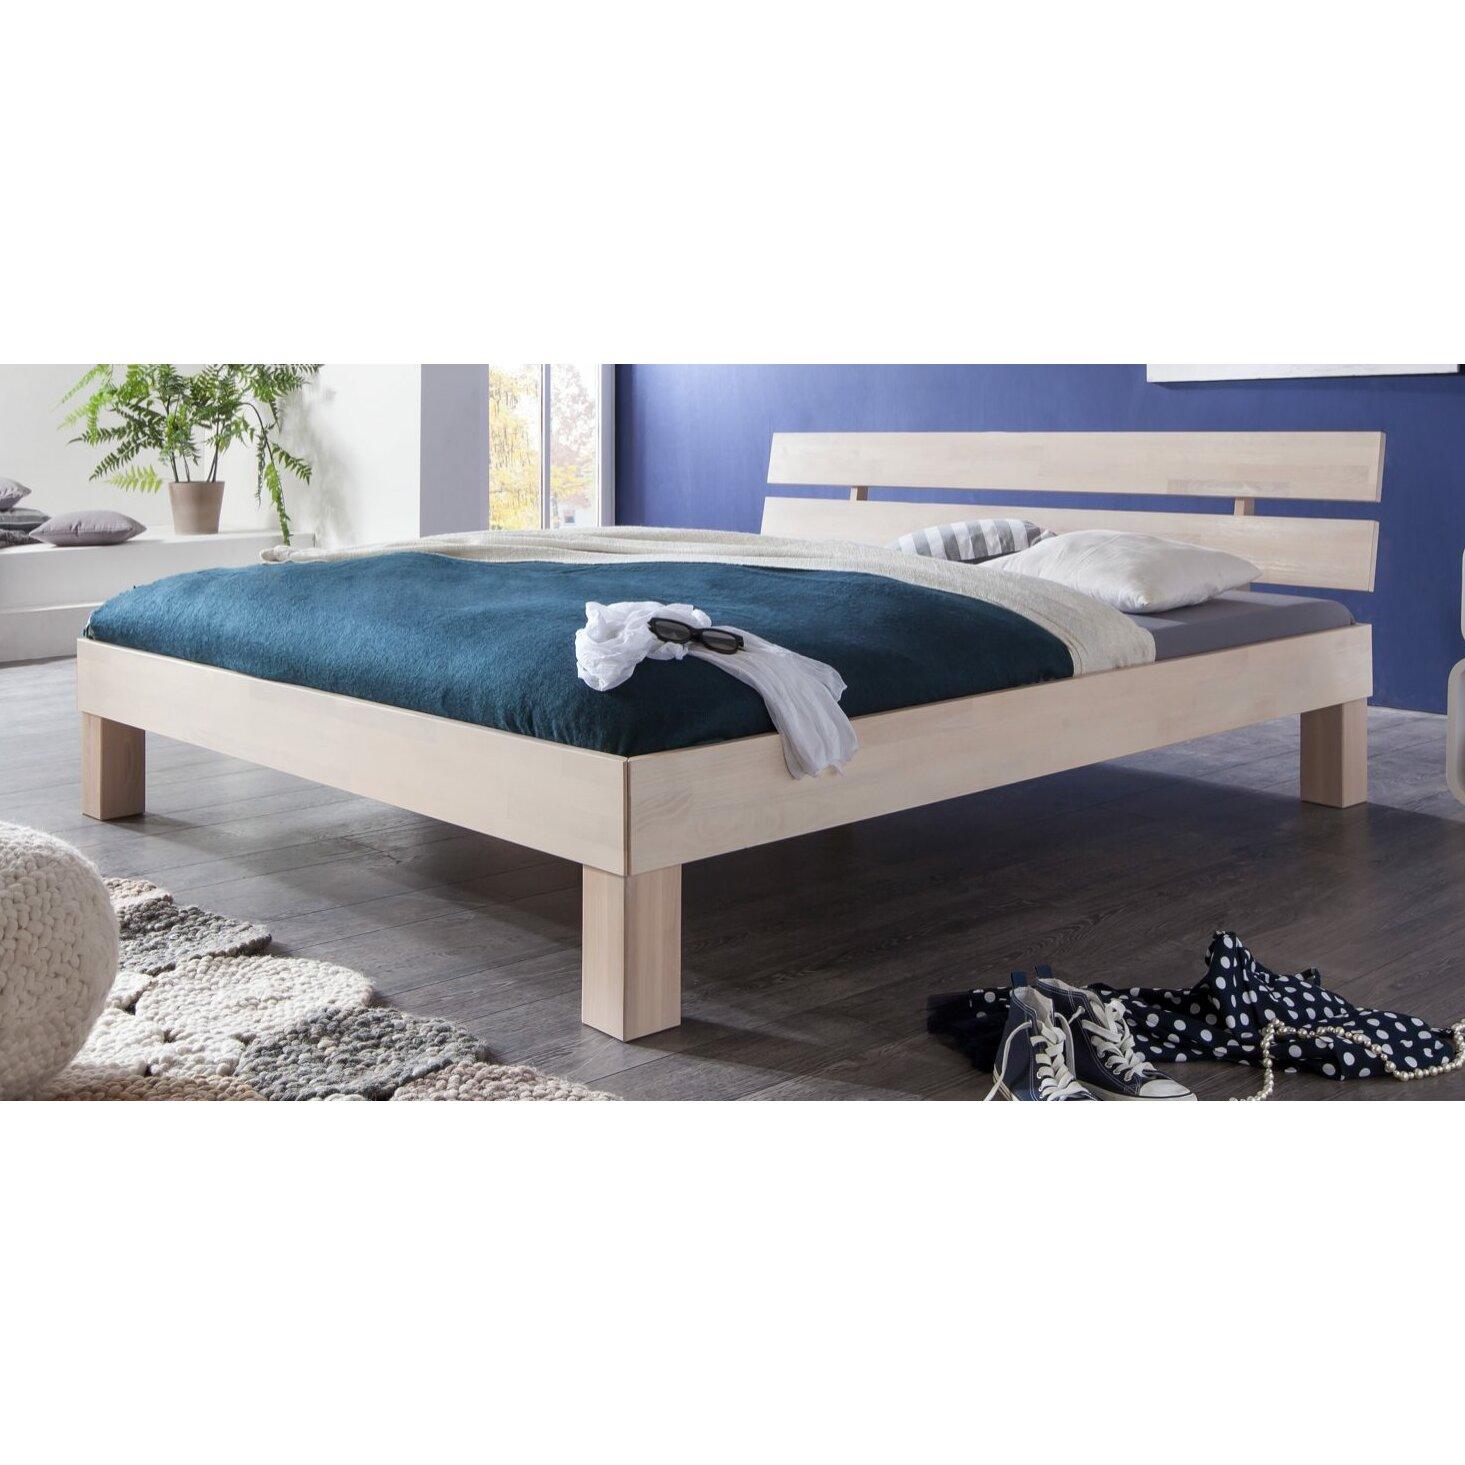 relita futonbett julia. Black Bedroom Furniture Sets. Home Design Ideas